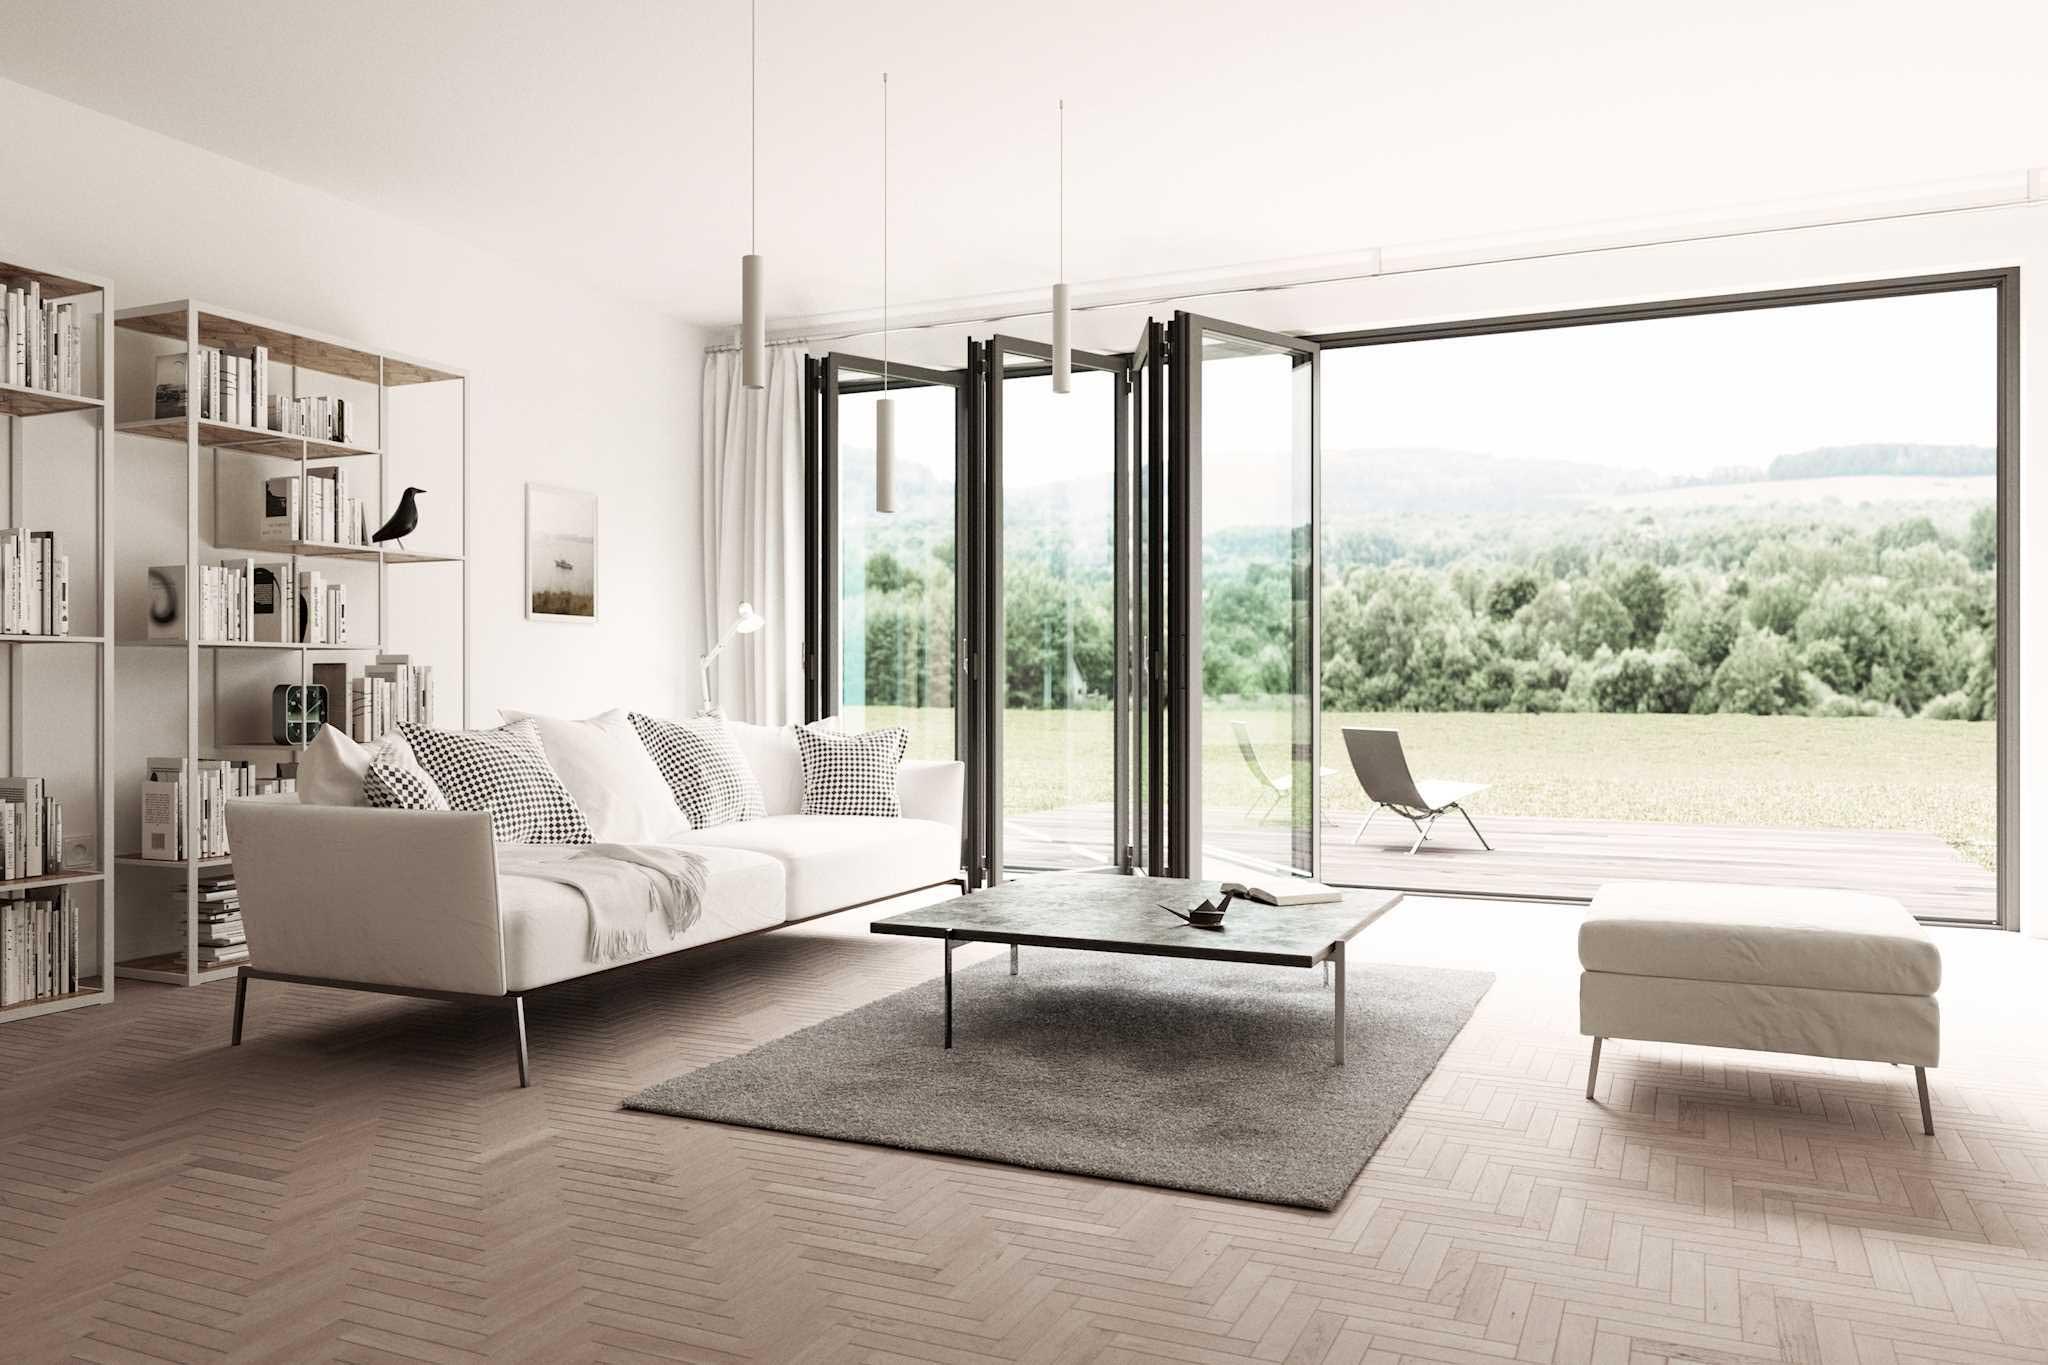 Solarlux Bifold Doors in Alumium - custom-built in Germany